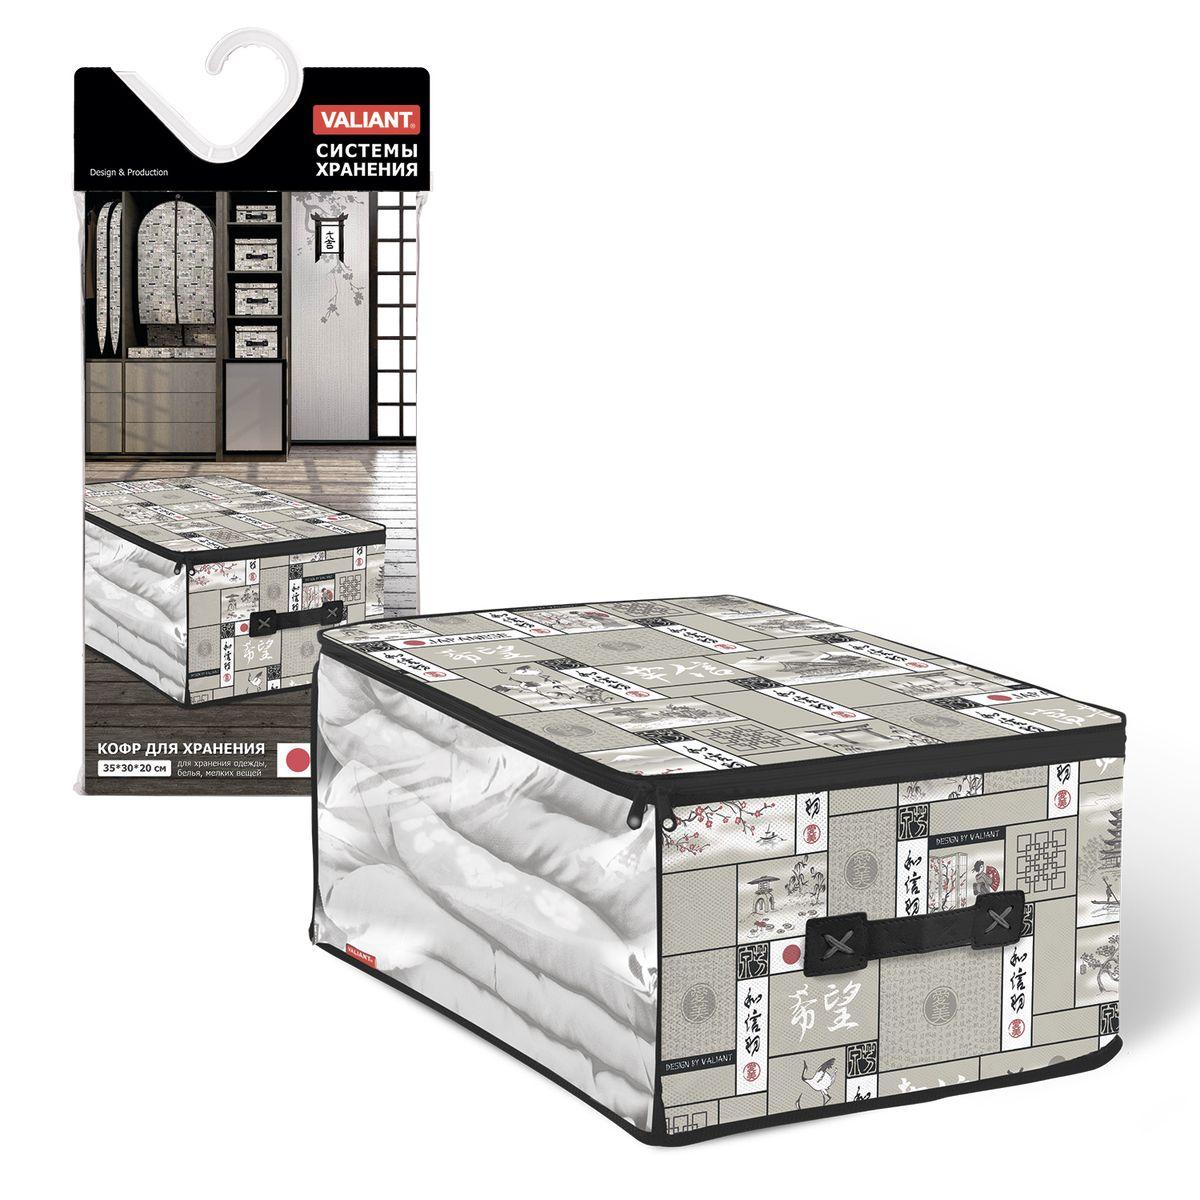 Кофр для хранения Valiant Japanese White, 35 х 30 х 20 см кофр для хранения valiant romantic 60 х 50 х 35 см